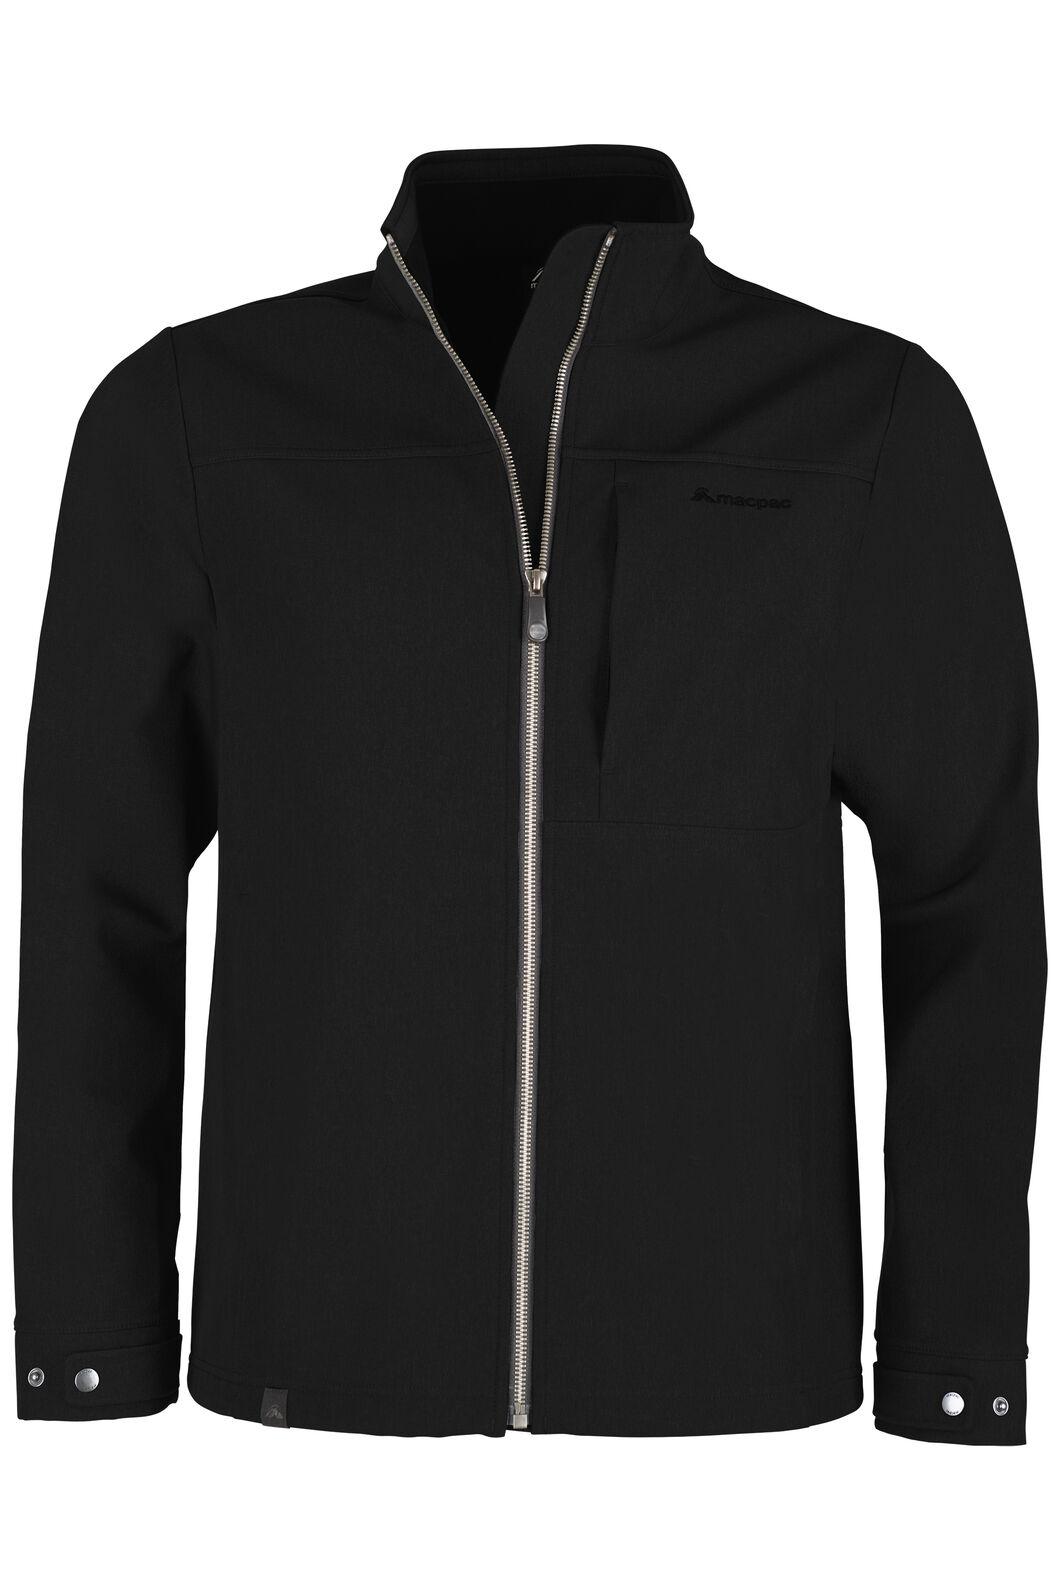 Macpac Chord Softshell Jacket - Men's, Black, hi-res